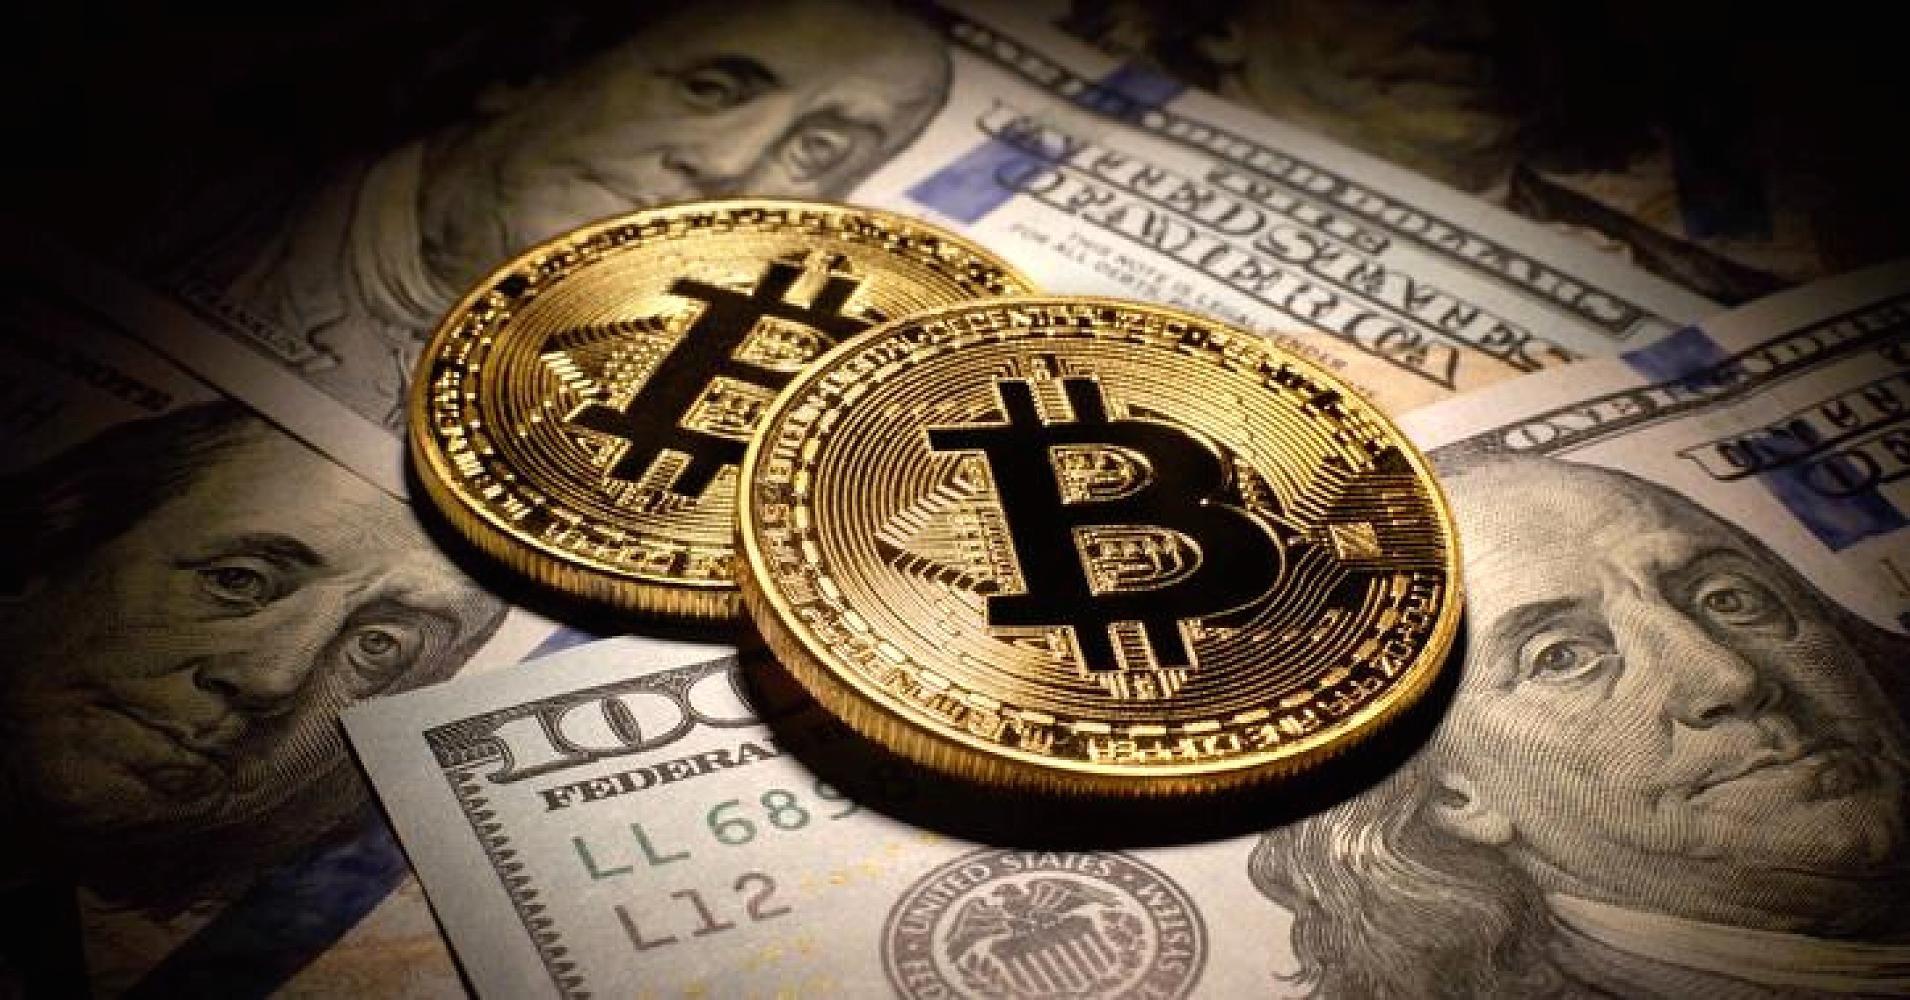 Cryptocurrency Exchange To Examine